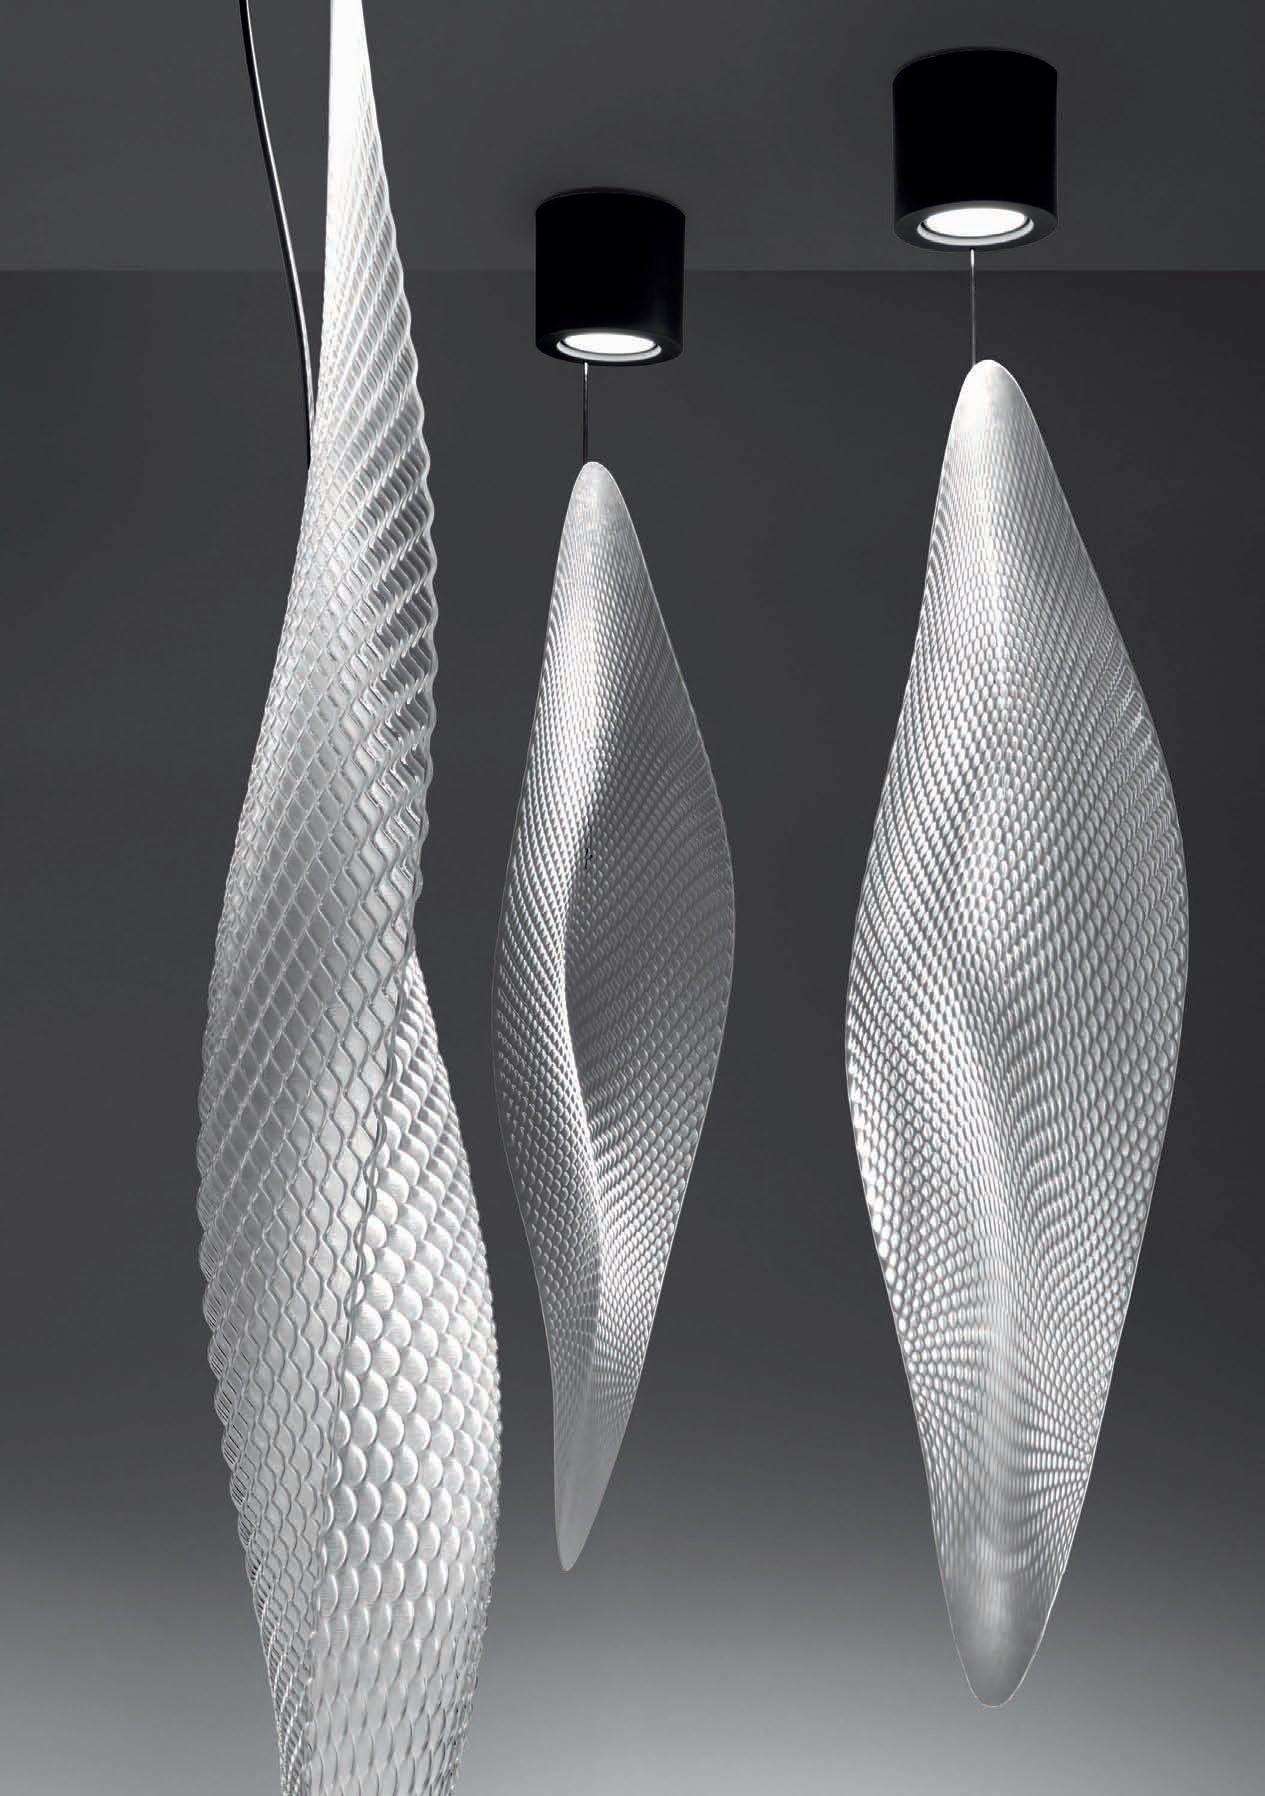 Cosmic leaf soffitto di artemide lampade a soffitto for Lampade a led vendita online